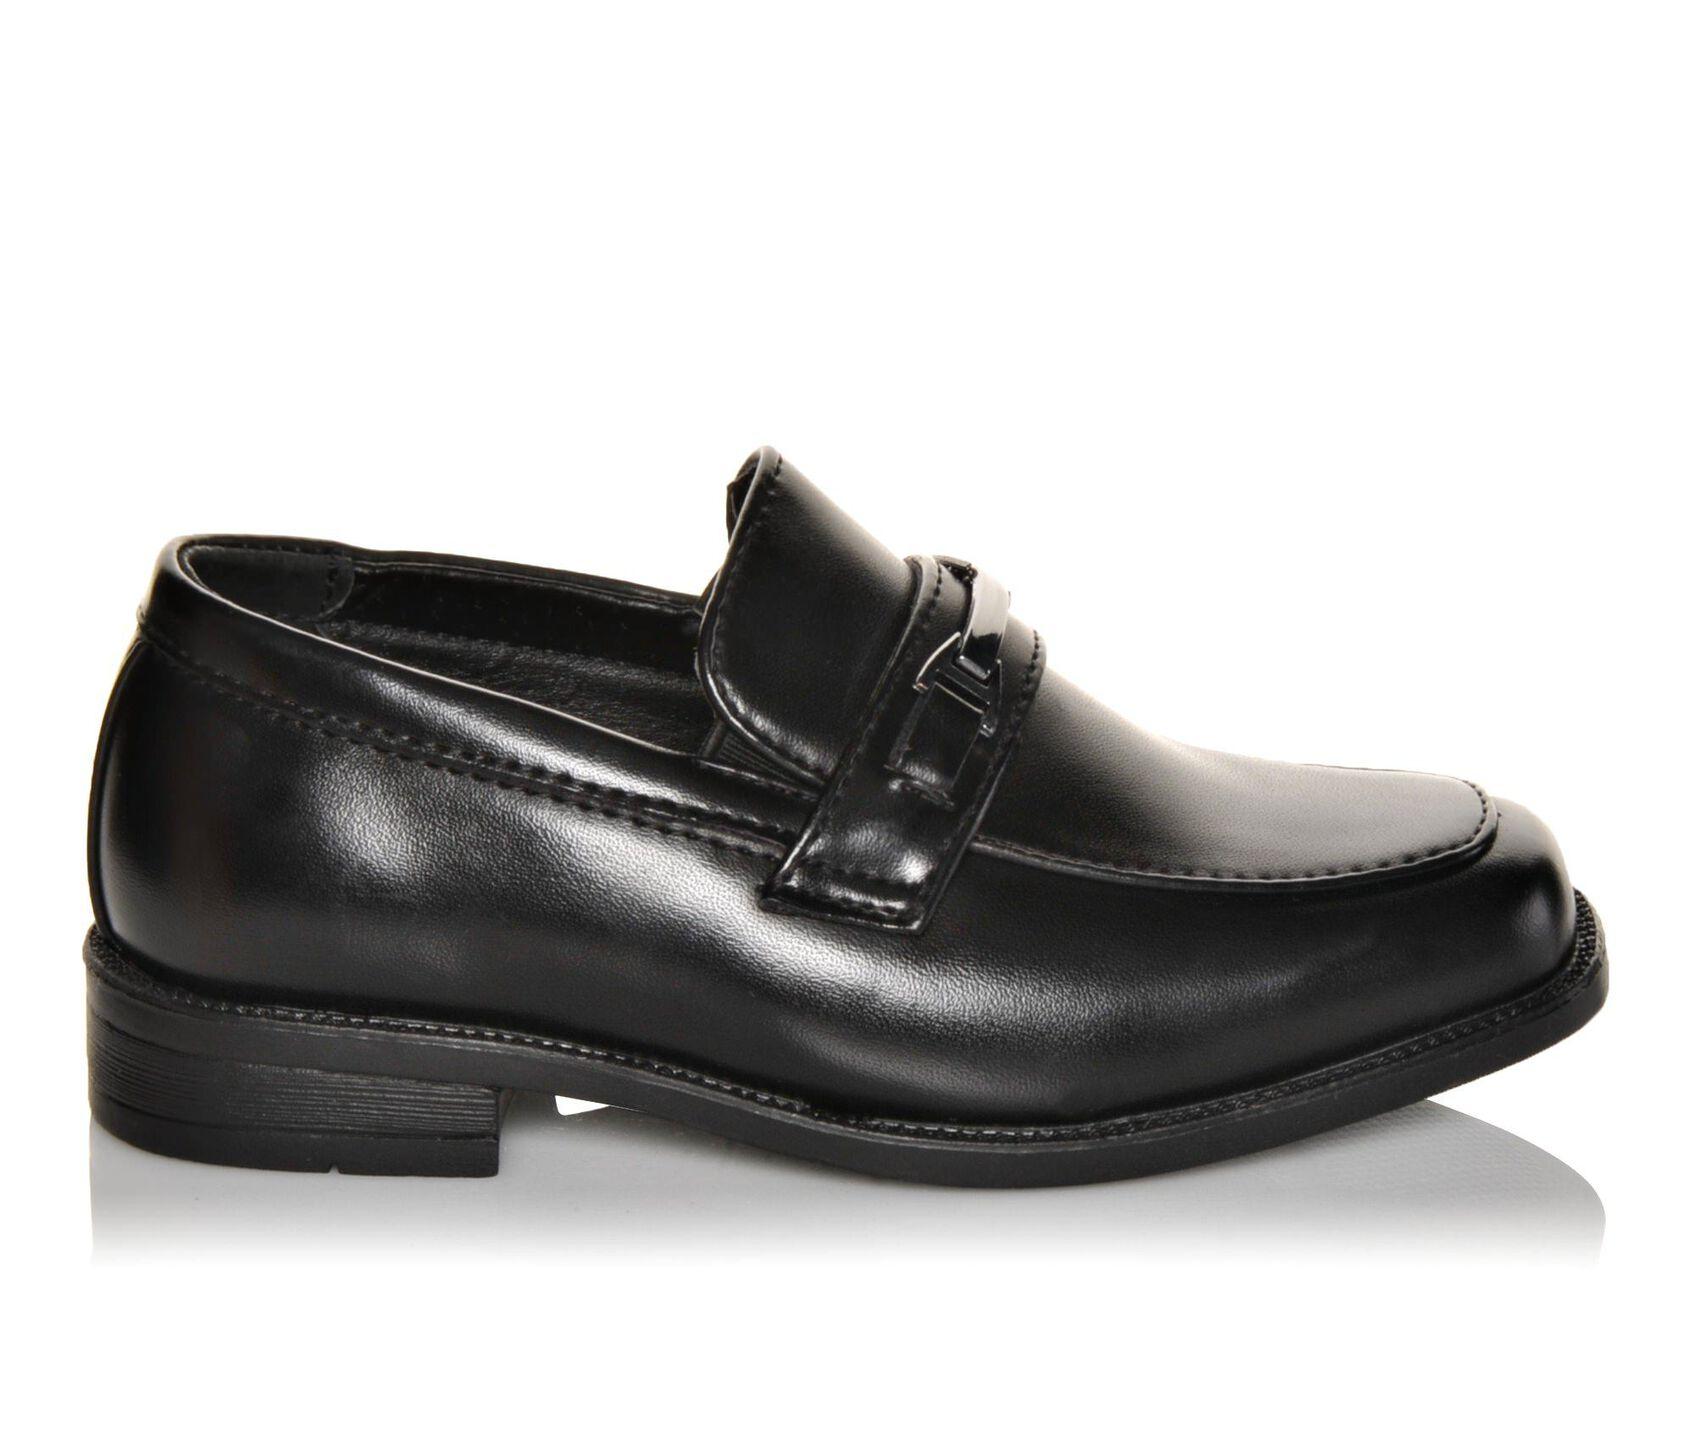 ebc2b8dba9 ... Perry Ellis Toddler Brian Dress Shoes. Previous